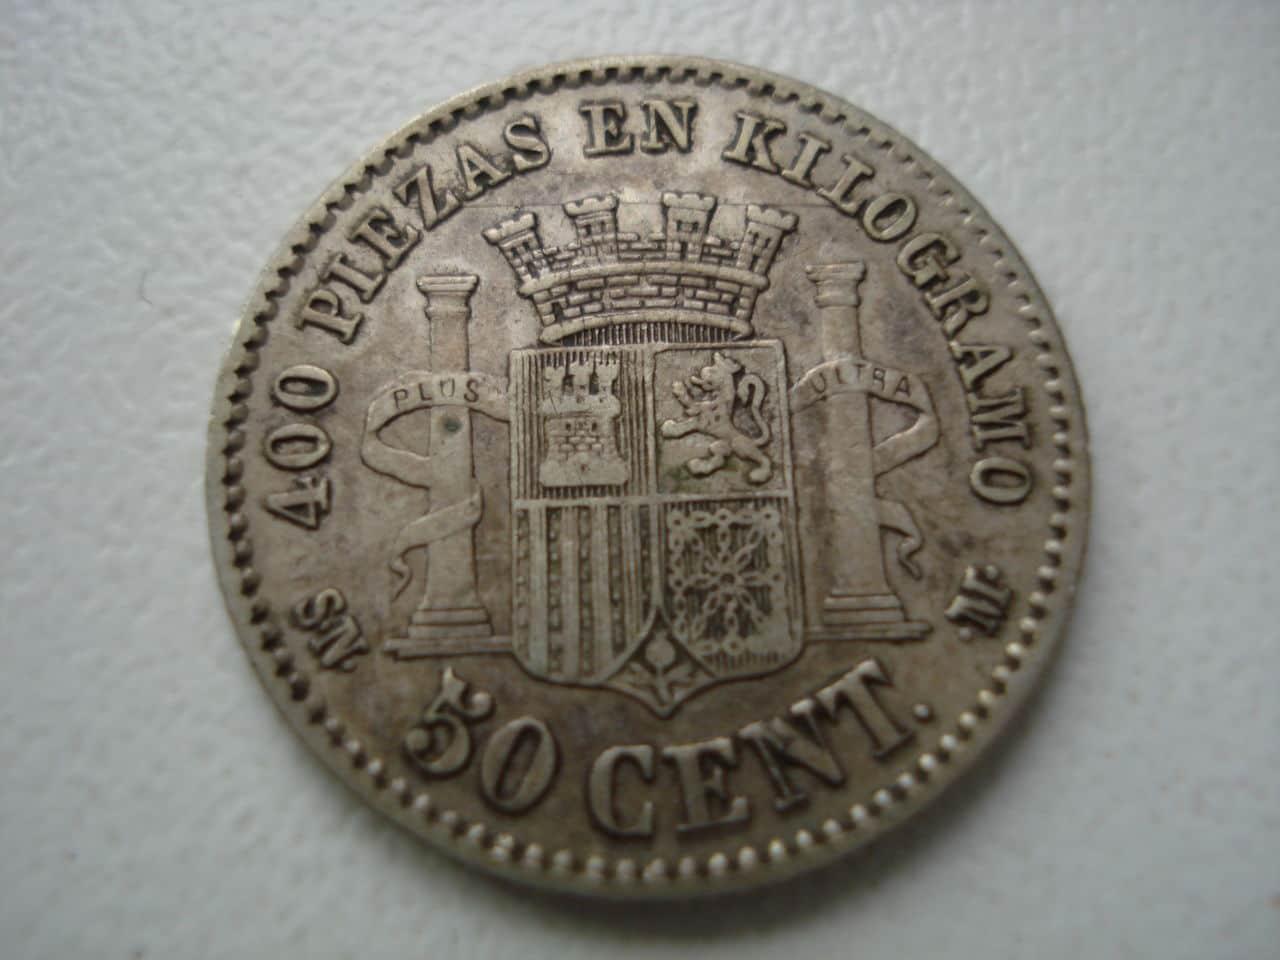 50 céntimos 1869. Gobierno Provisional. Monadas2_005